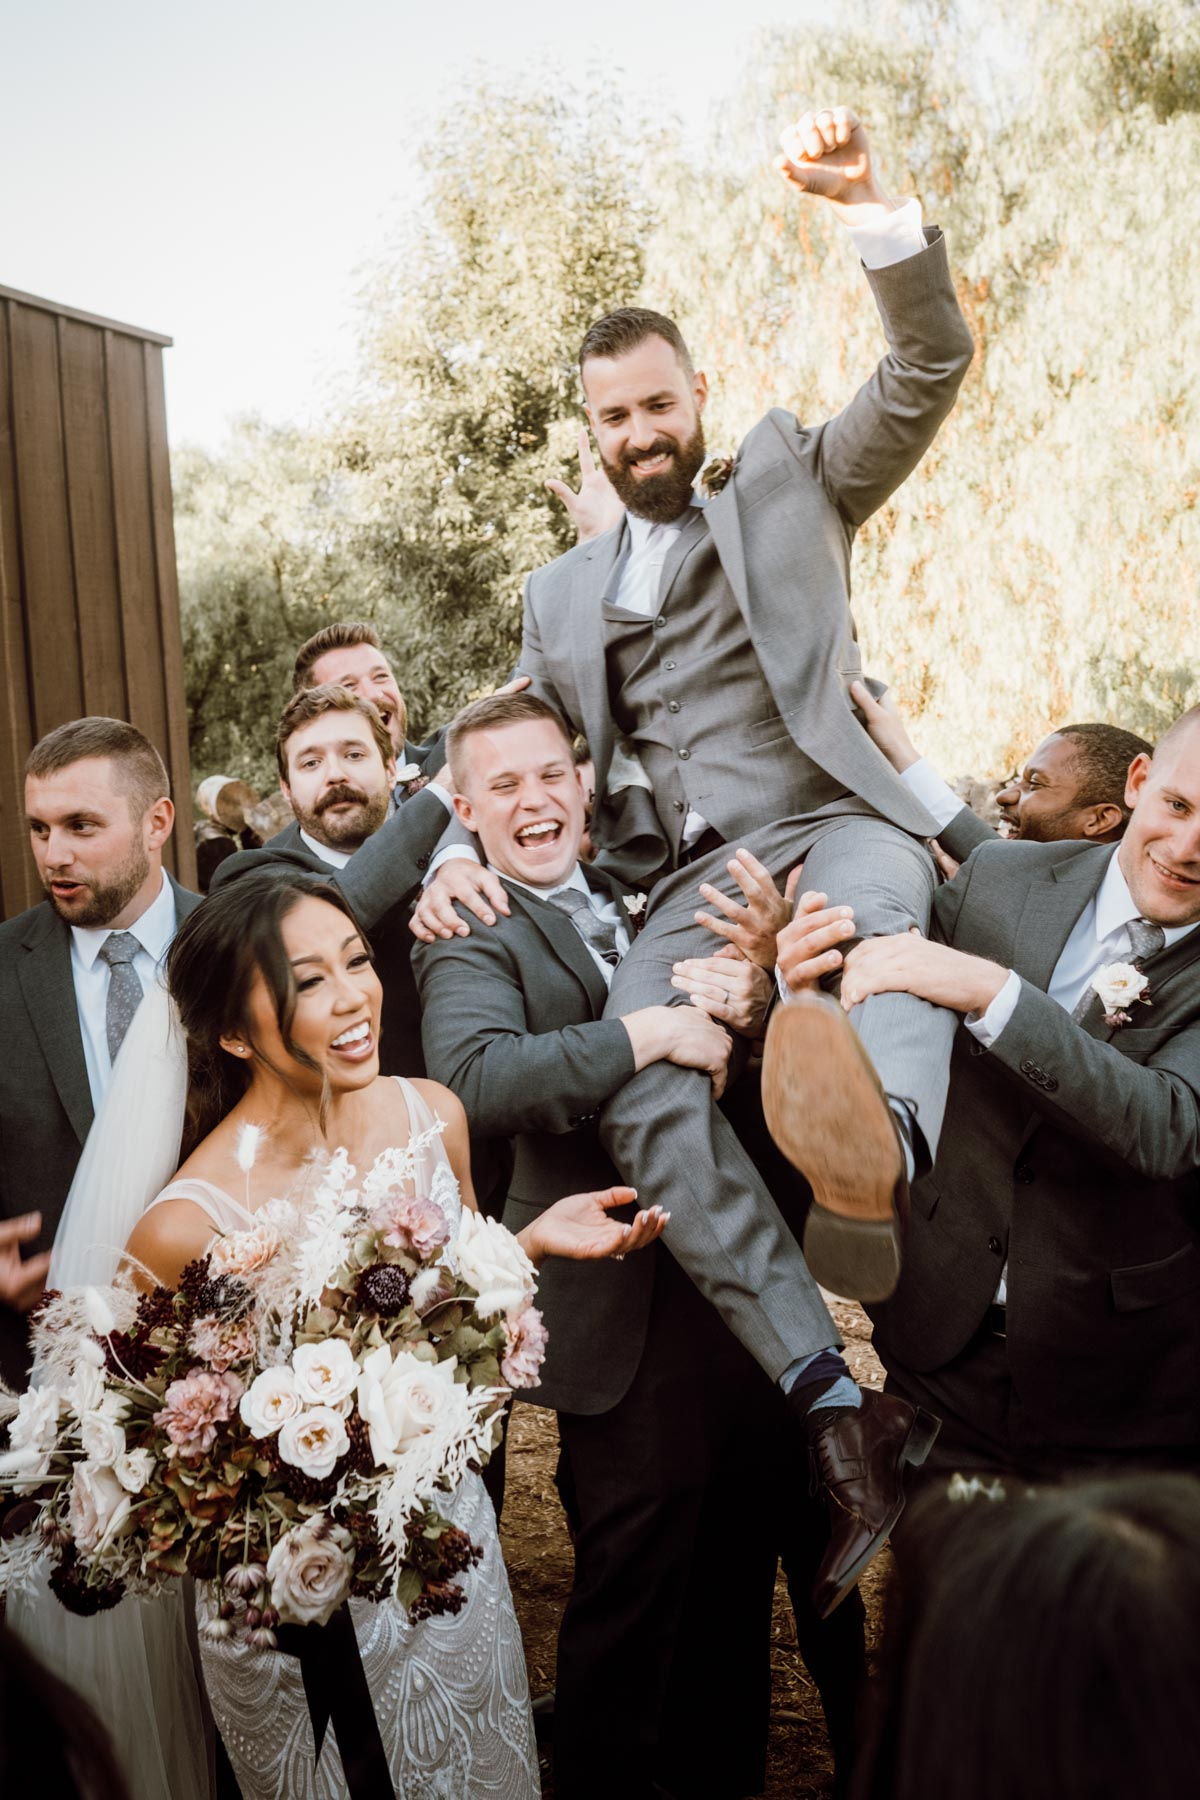 ethereal gardens wedding squad goals 1